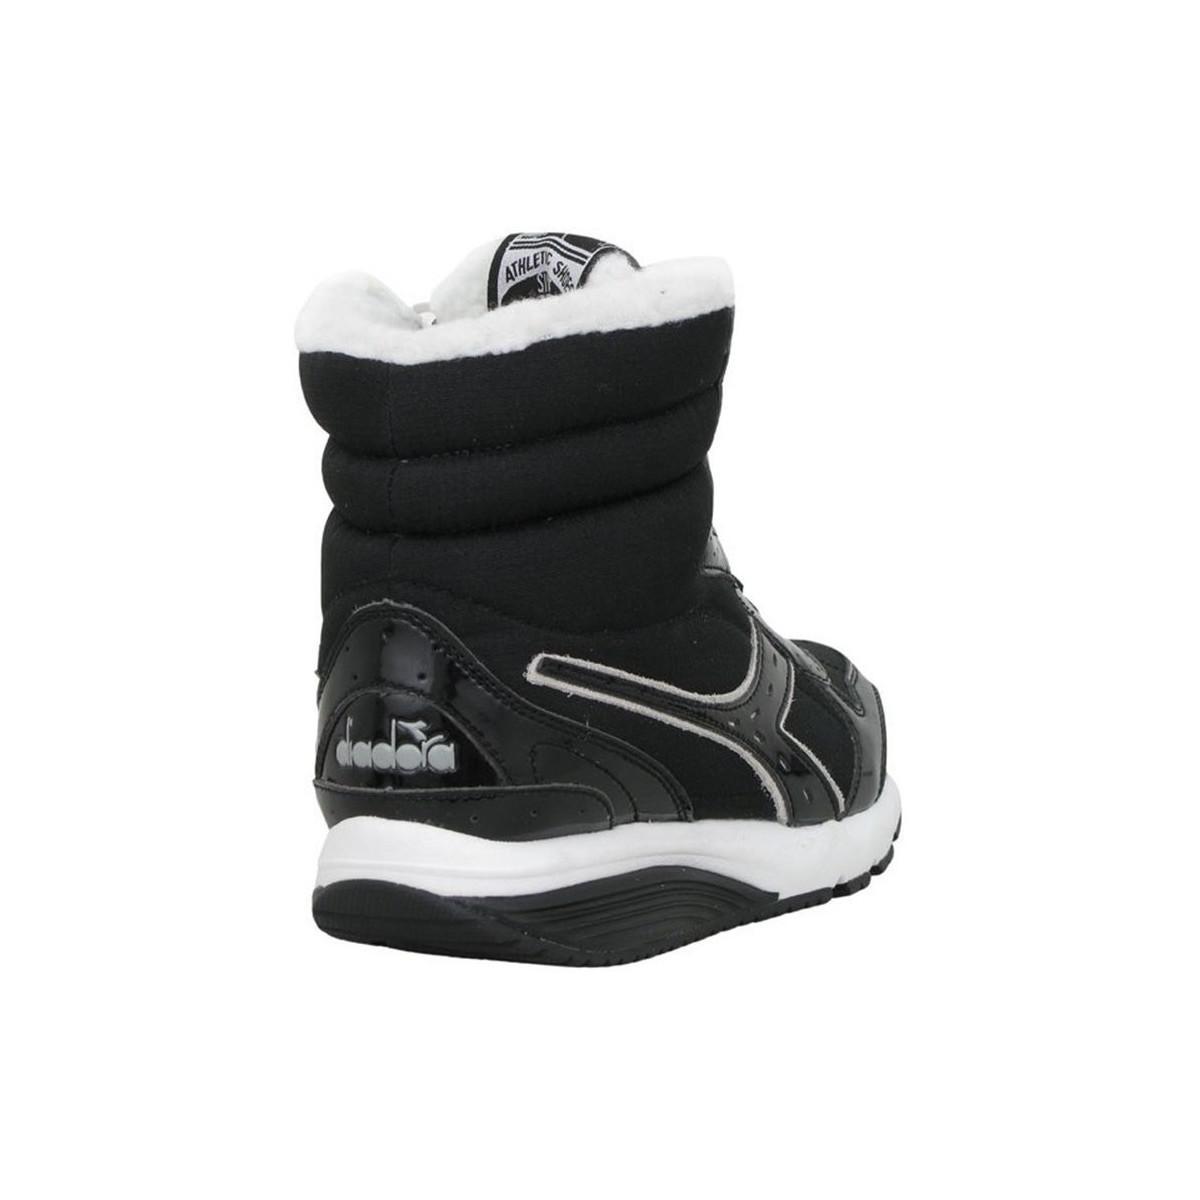 Diadora Chaussures Crypton Dina Snow Diadora VhJI7vJ